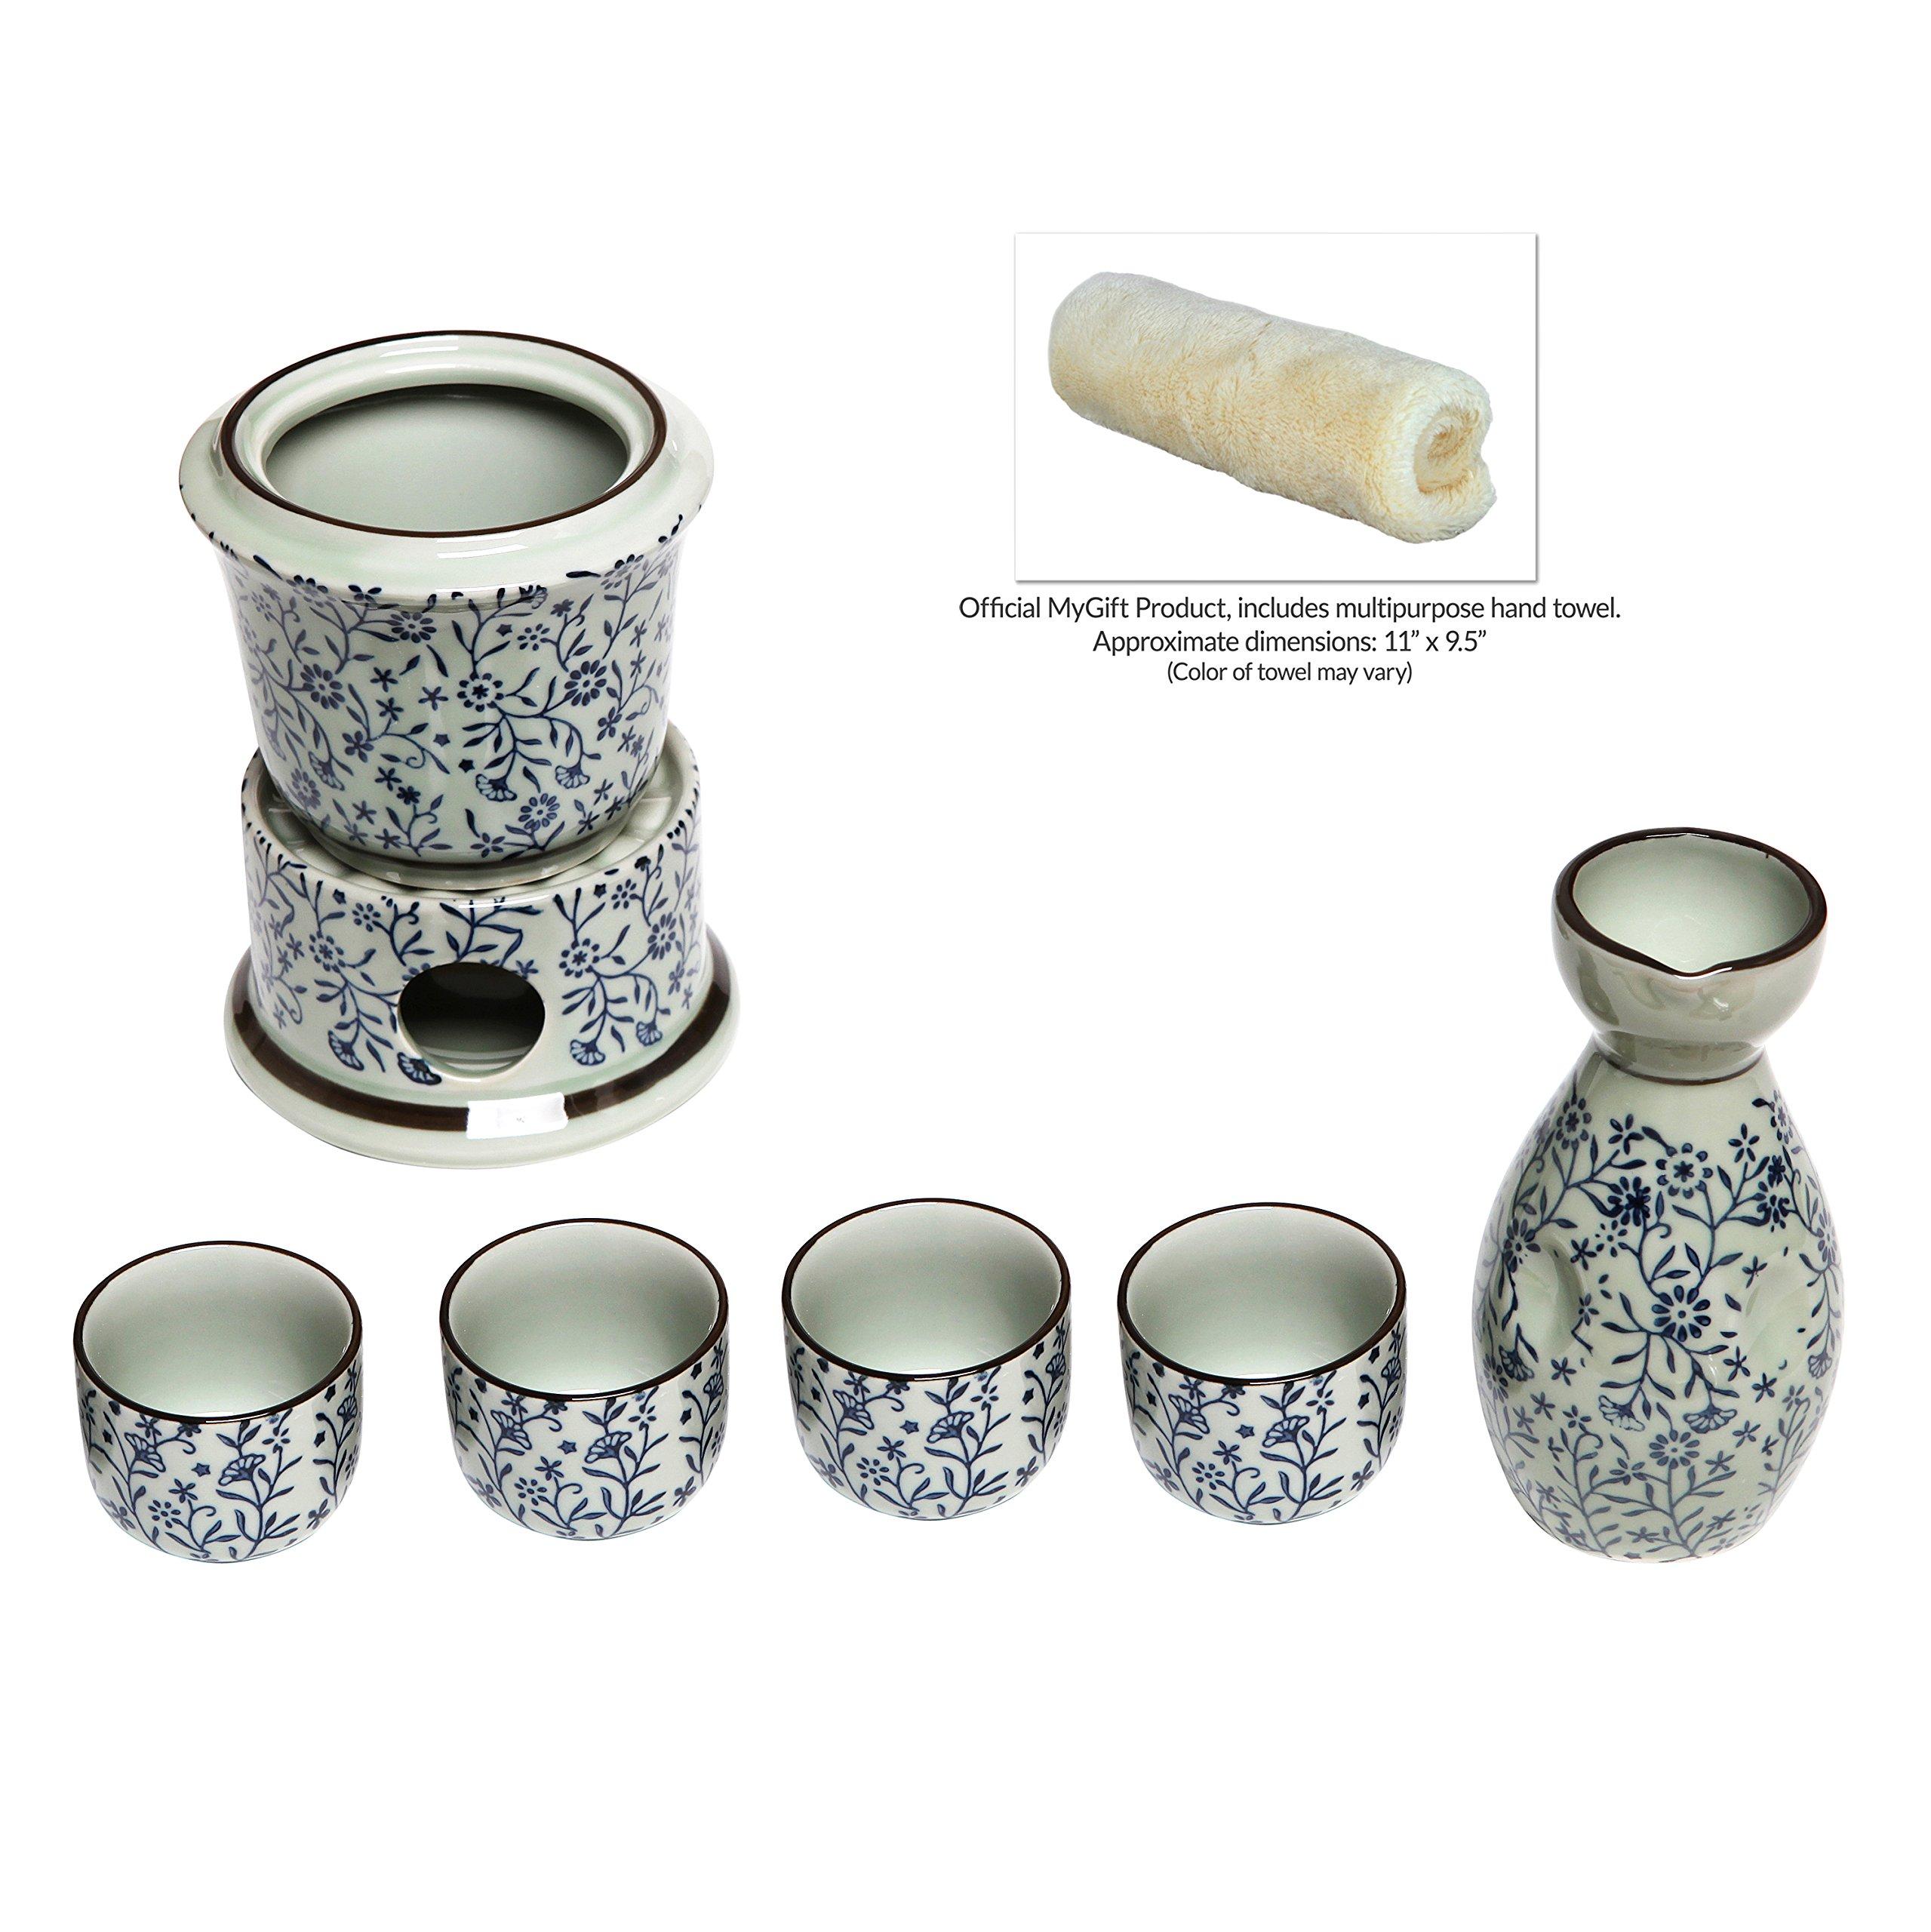 Exquisite Ceramic Blue Flowers Japanese Sake Set w/ 4 Shot Glass/Cups, Serving Carafe & Warmer Bowl by MyGift (Image #4)